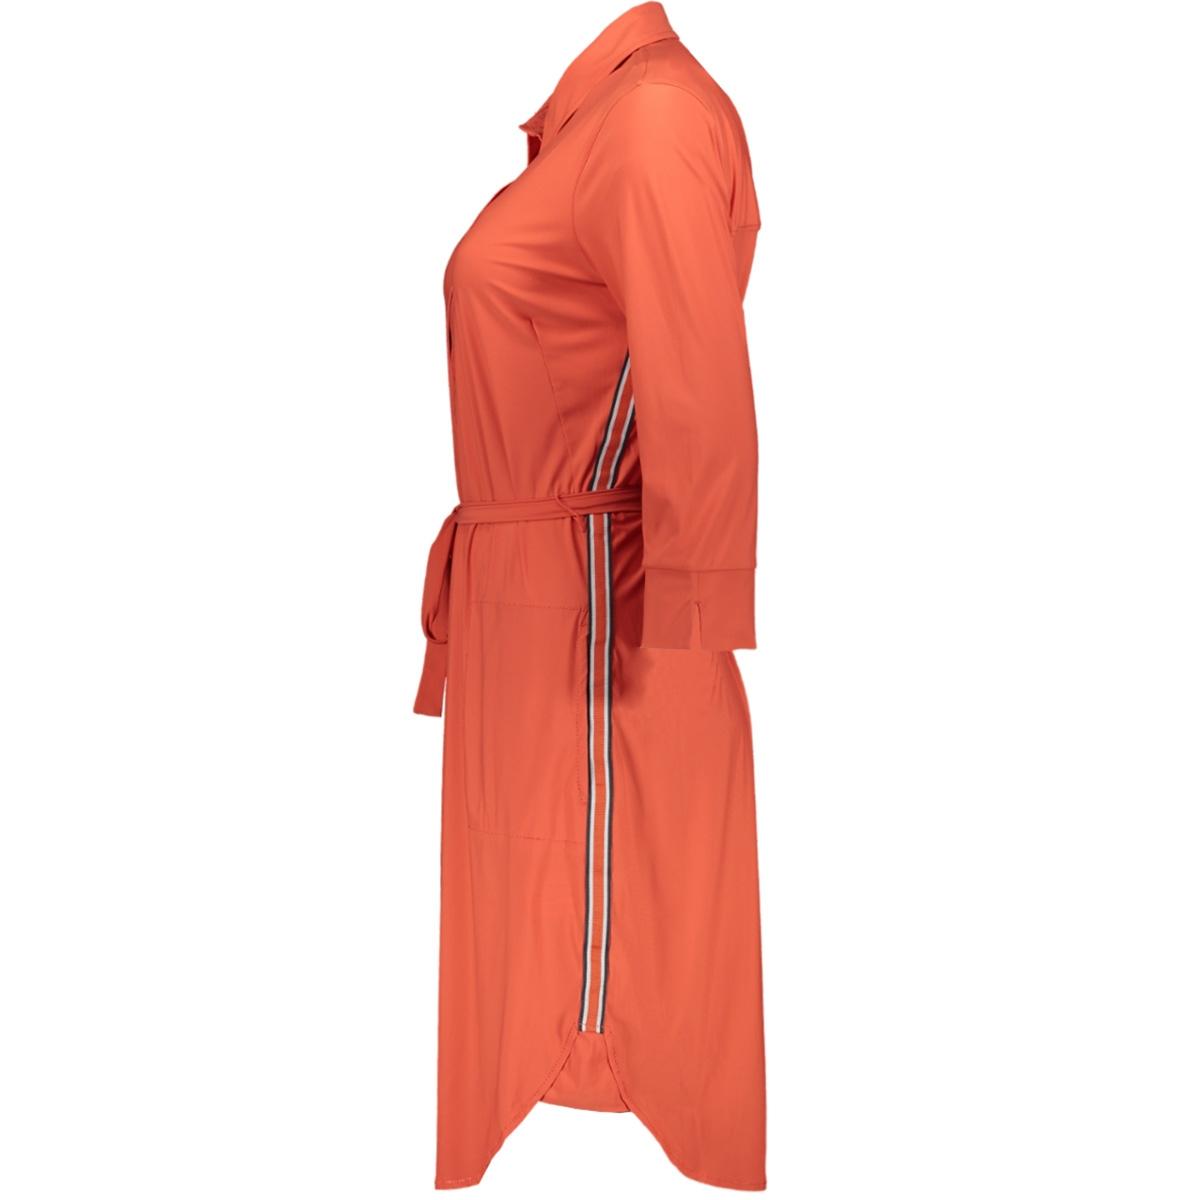 jurk jersey 23001430 sandwich jurk 20165